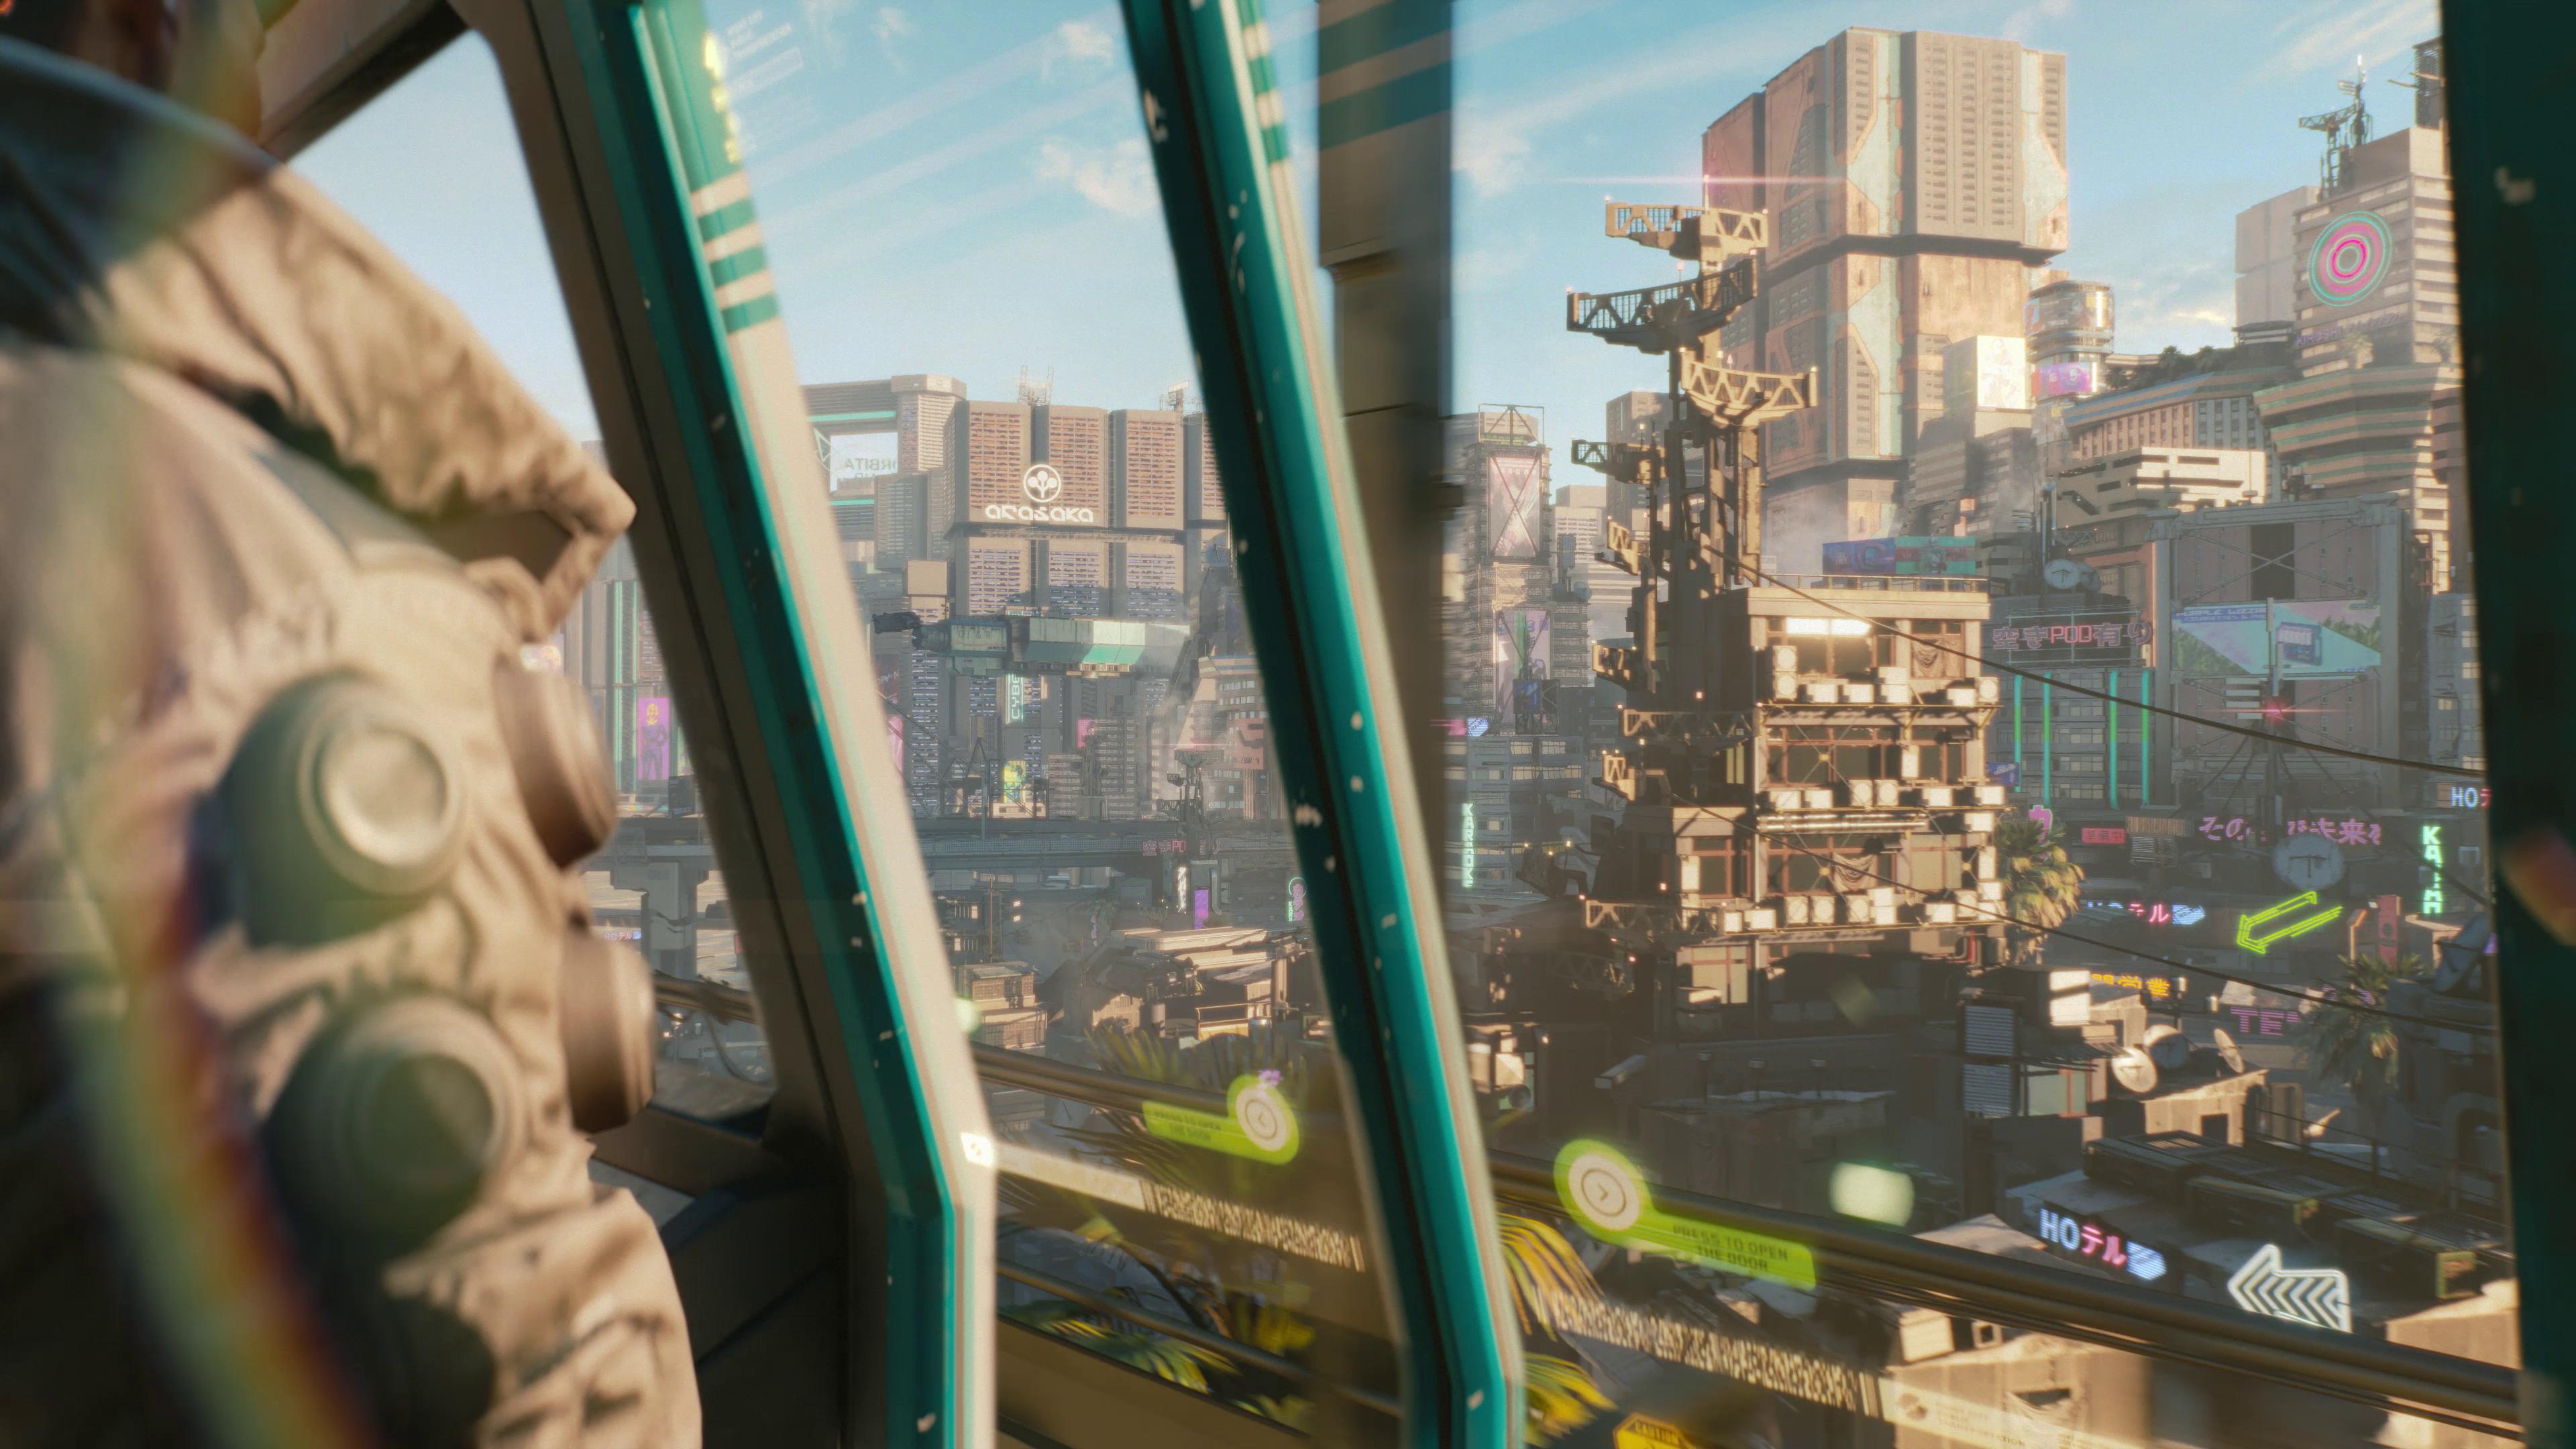 Cyberpunk 2077 E3 2018-Trailer: Frame by Frame EP01 - Cyberpunk 2077 ...